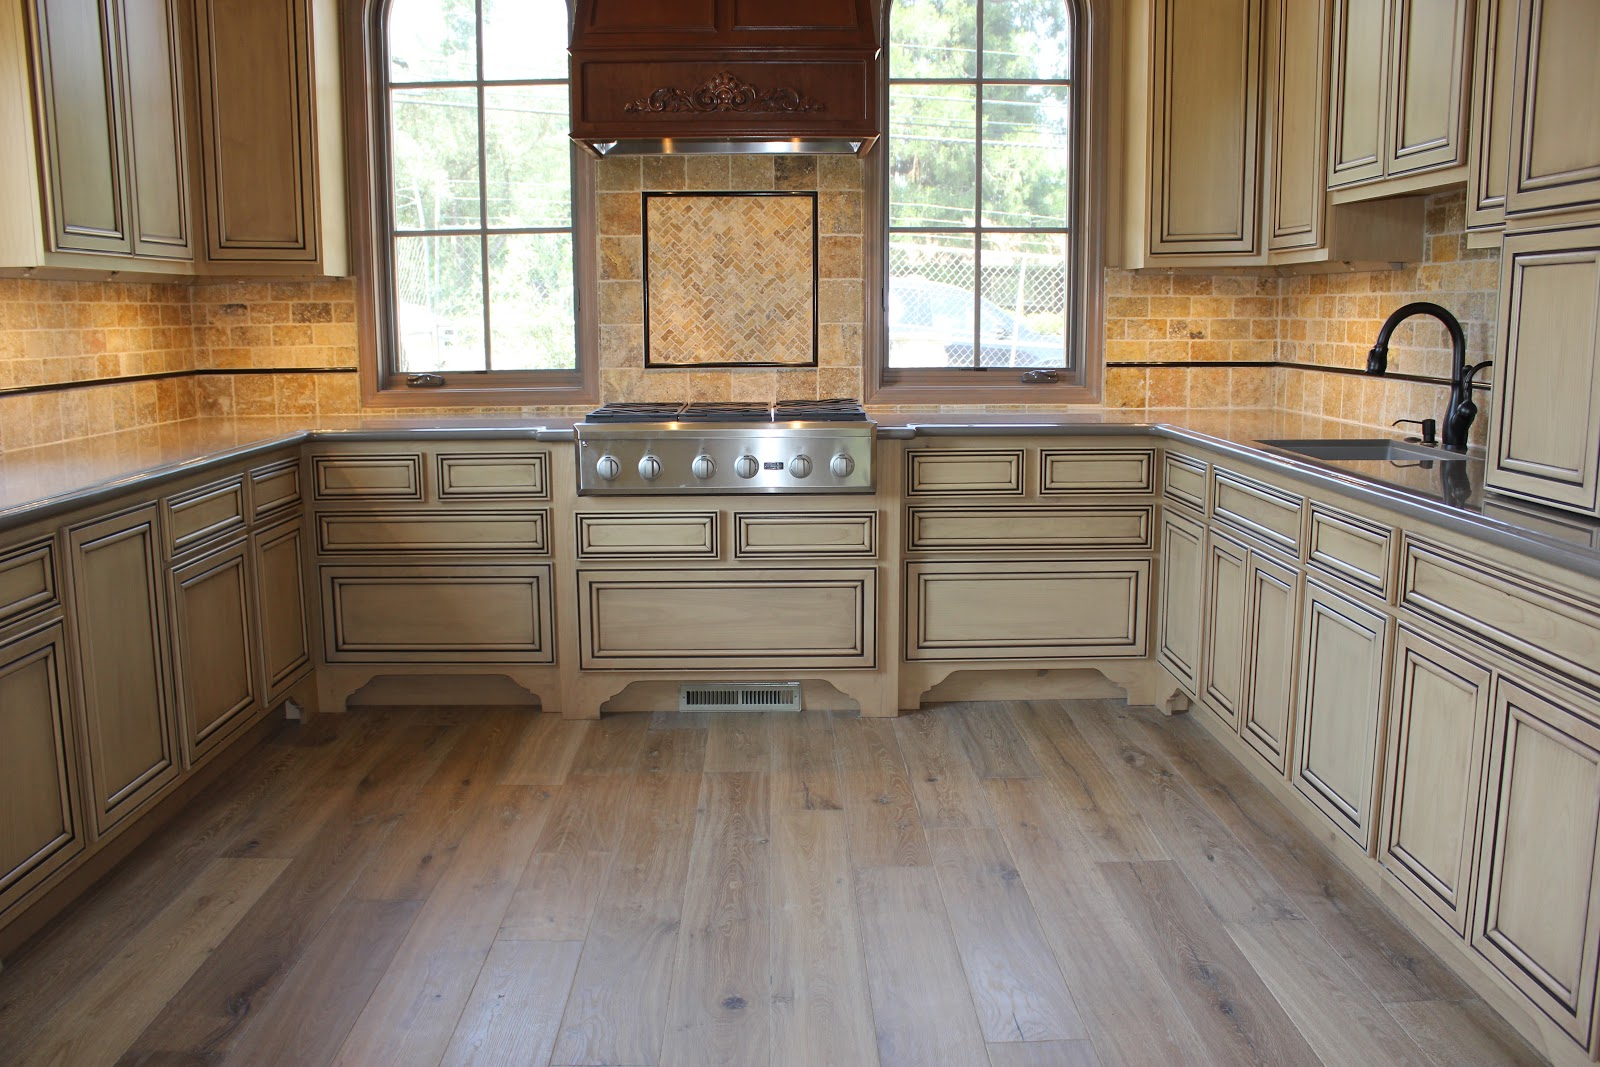 Simas Floor and Design Company: Hardwood Flooring by Royal Oak